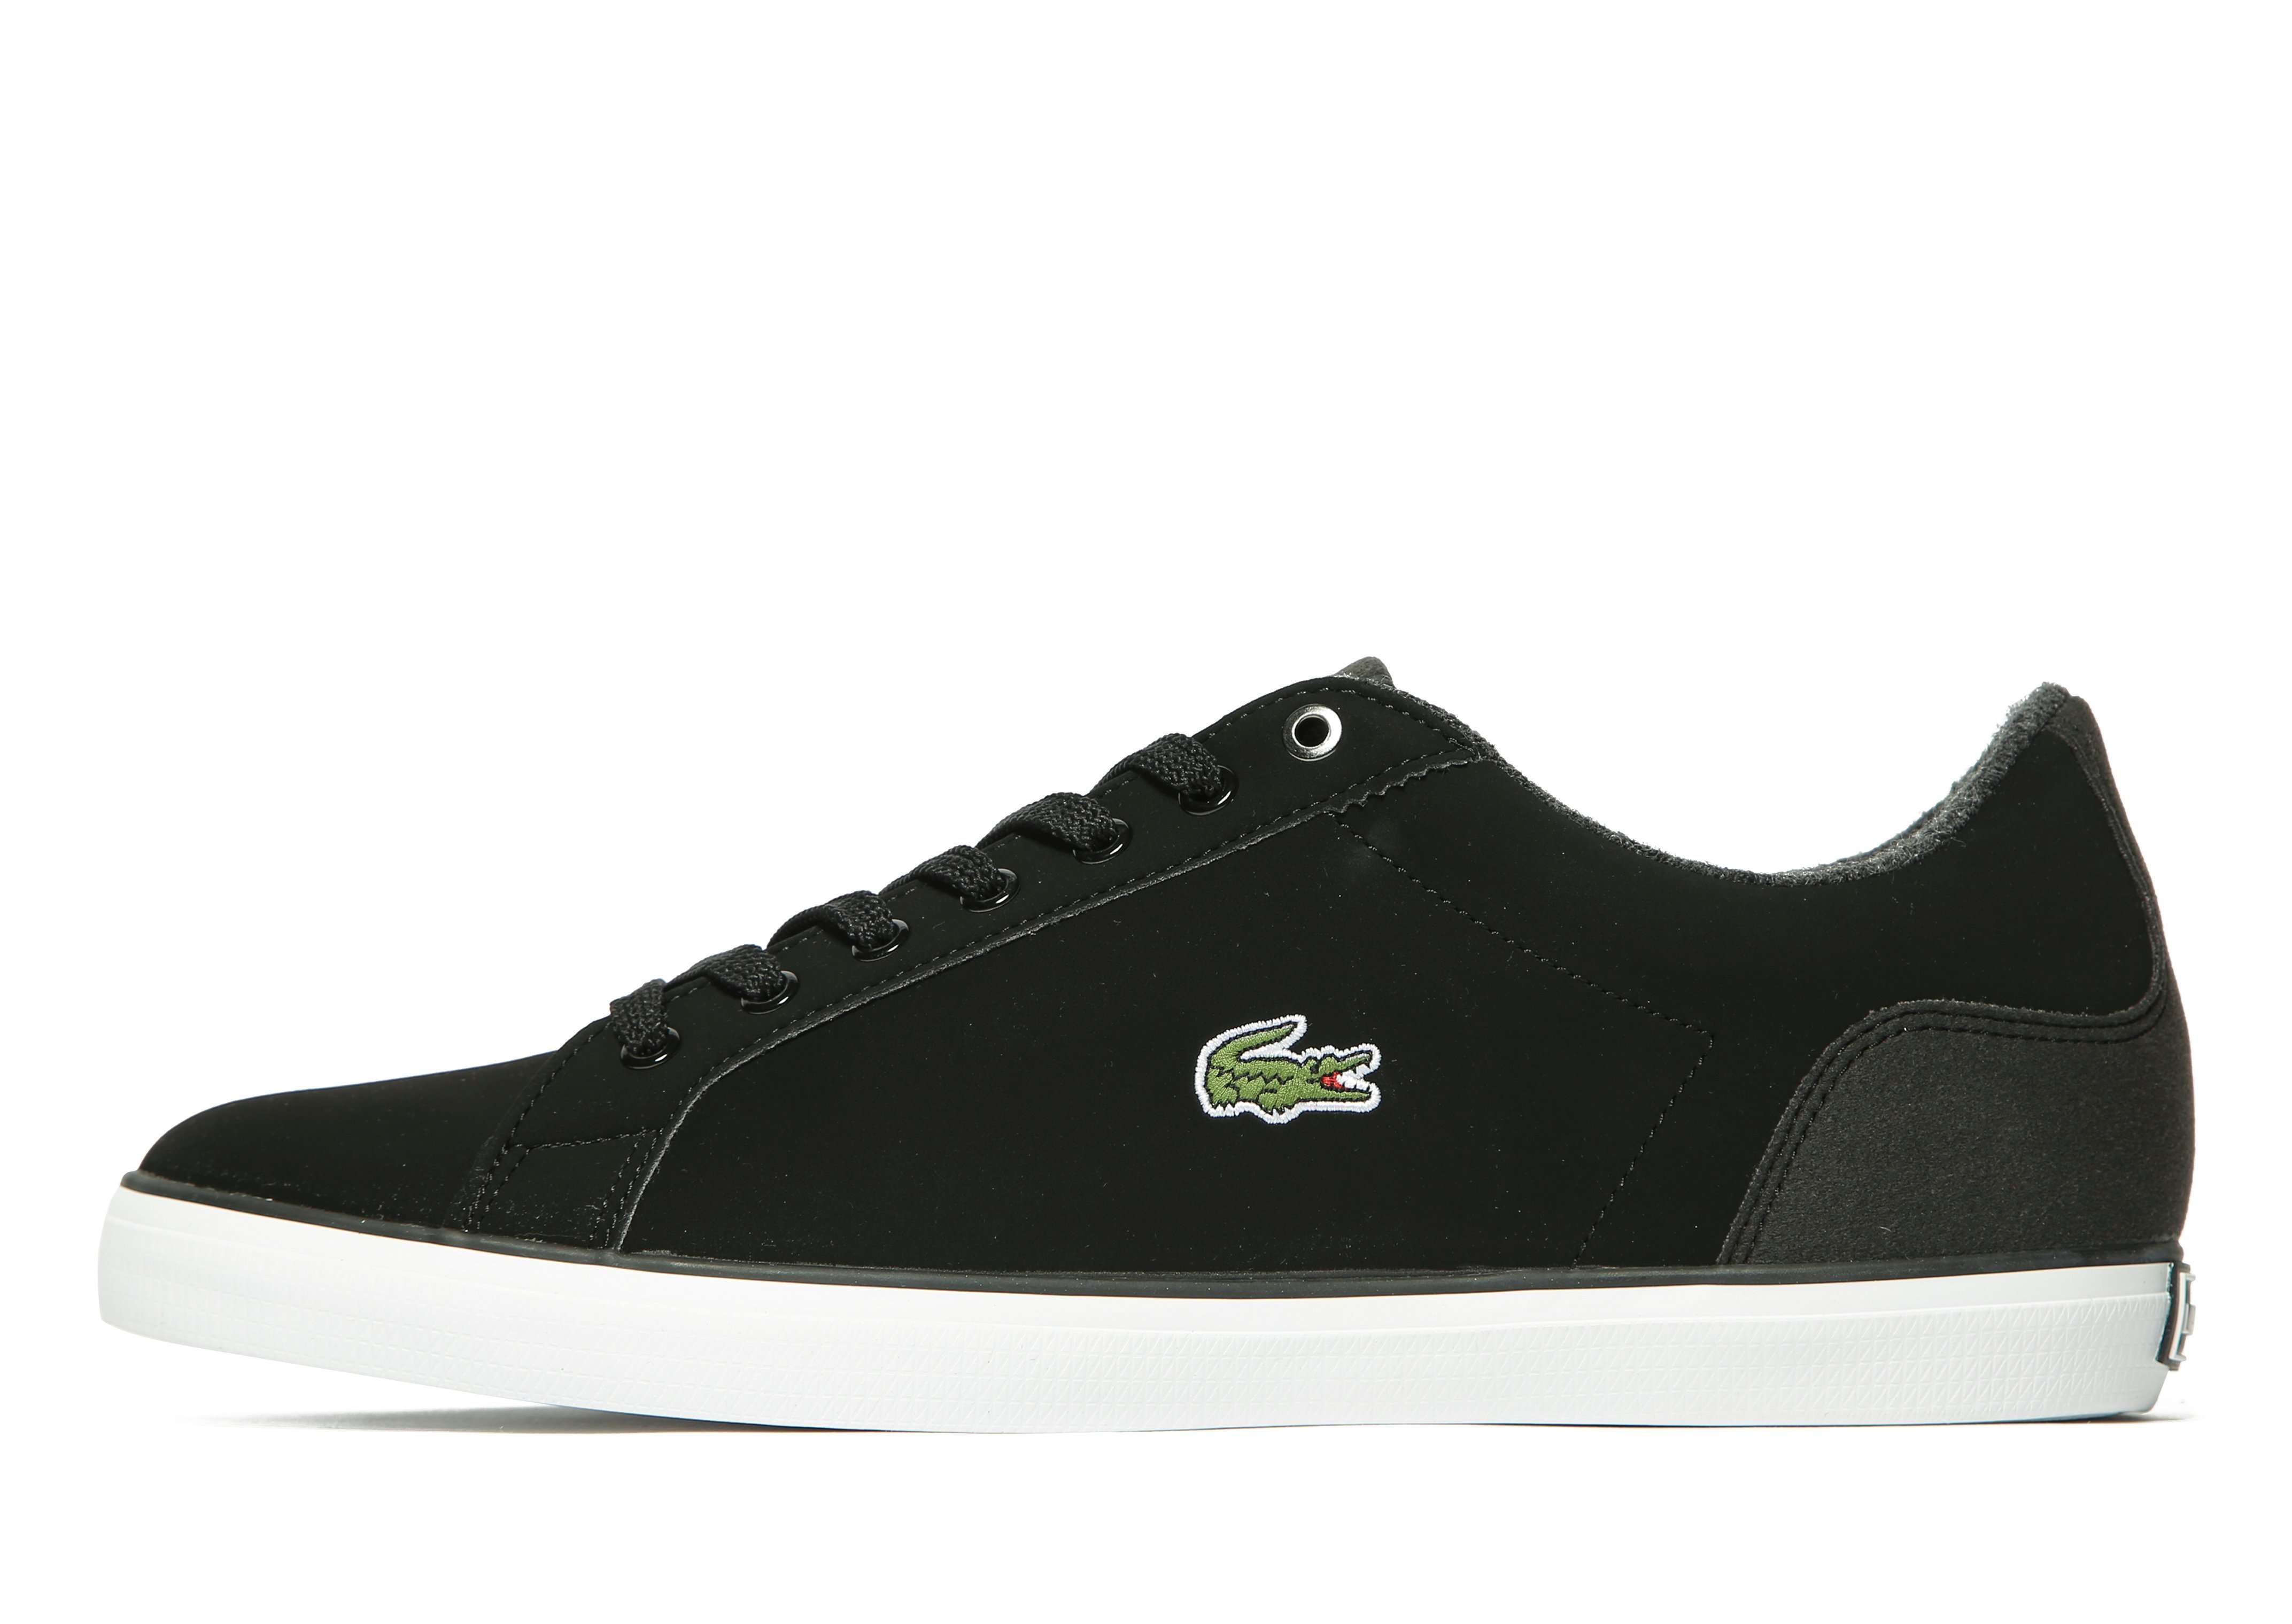 Lacoste Lerond Nubuck - Men's Skate Shoes - Black 298512